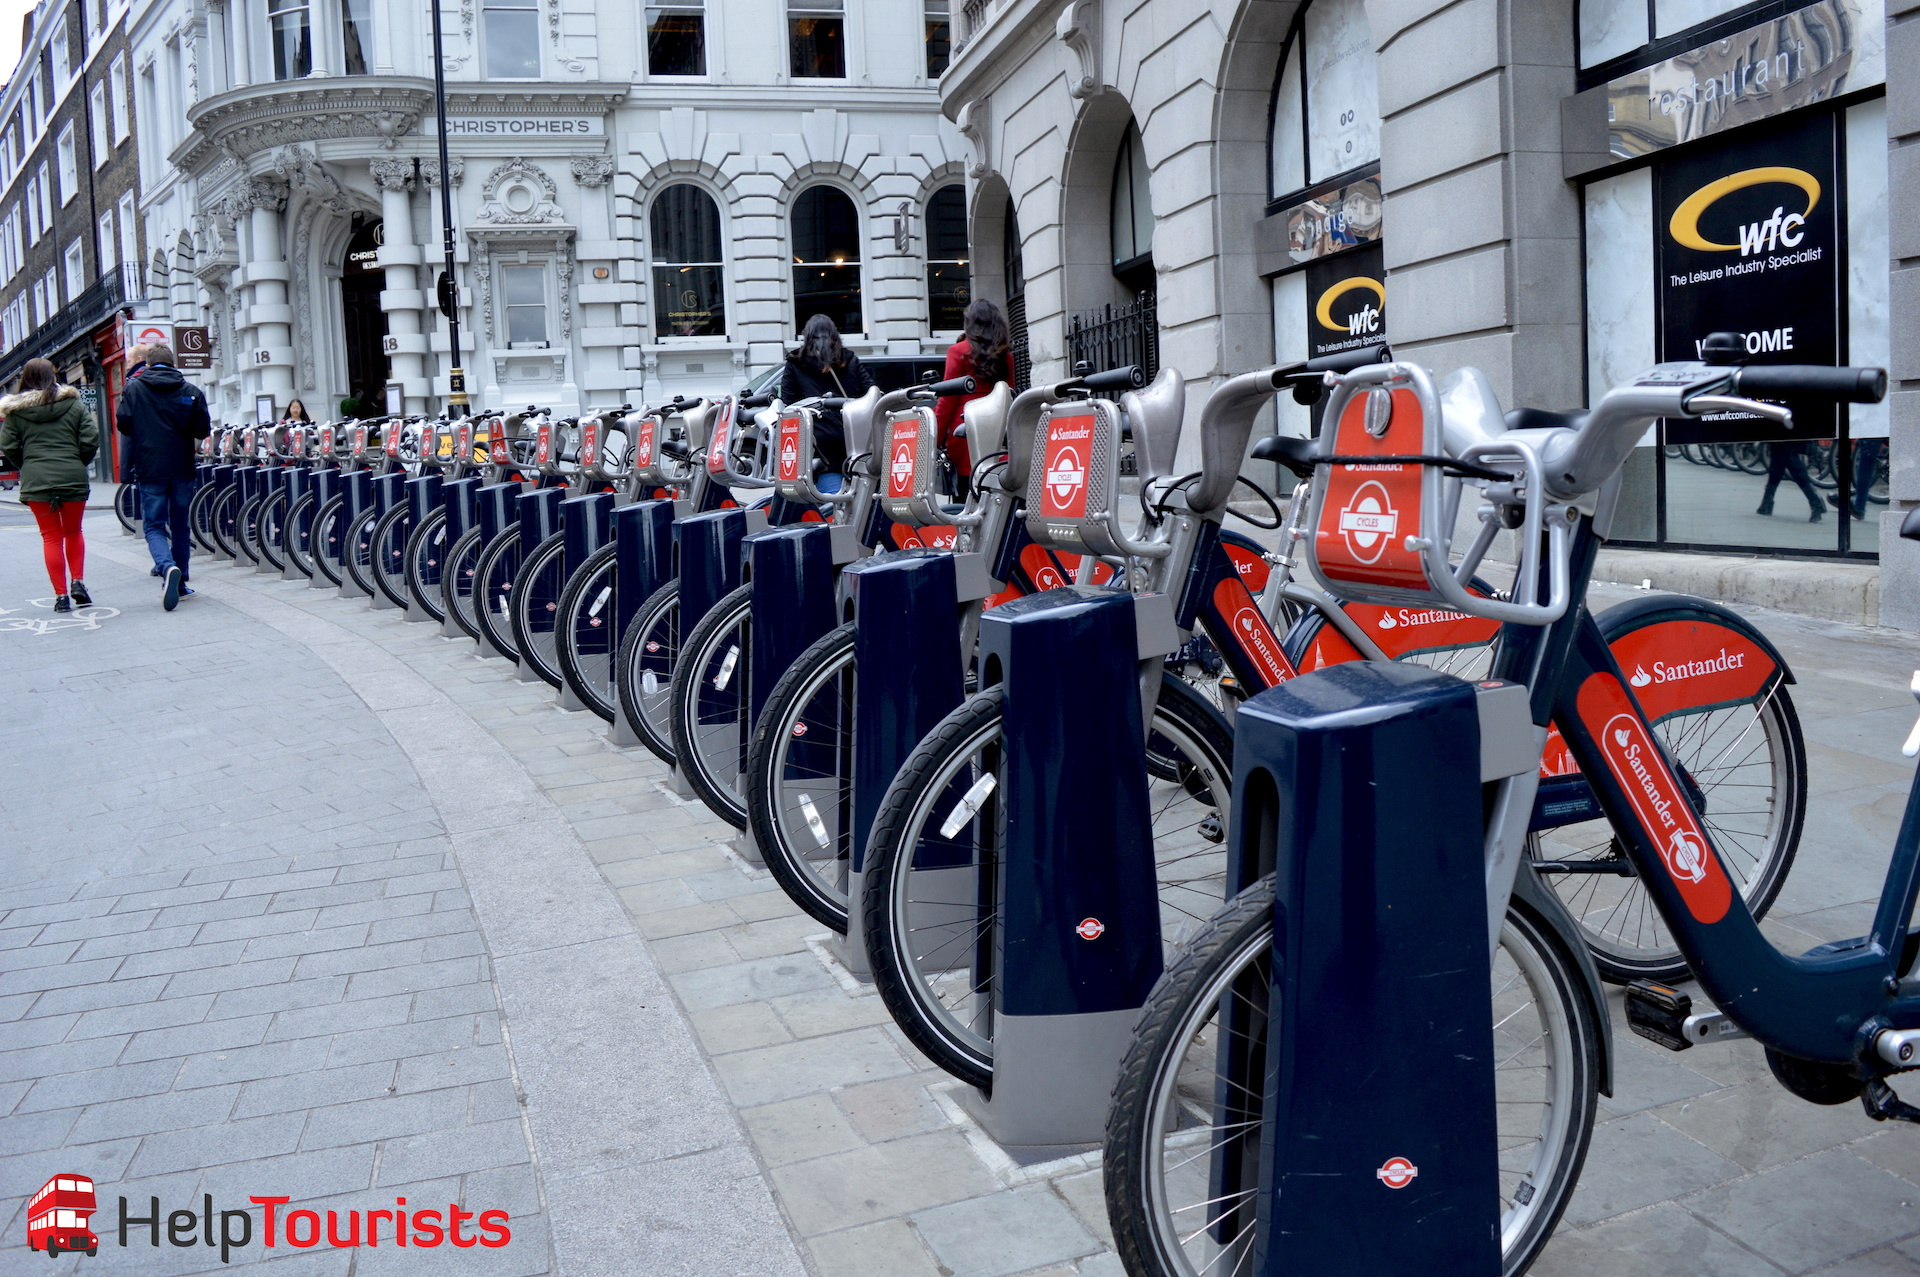 Fahrrad ausleihen Santander in London